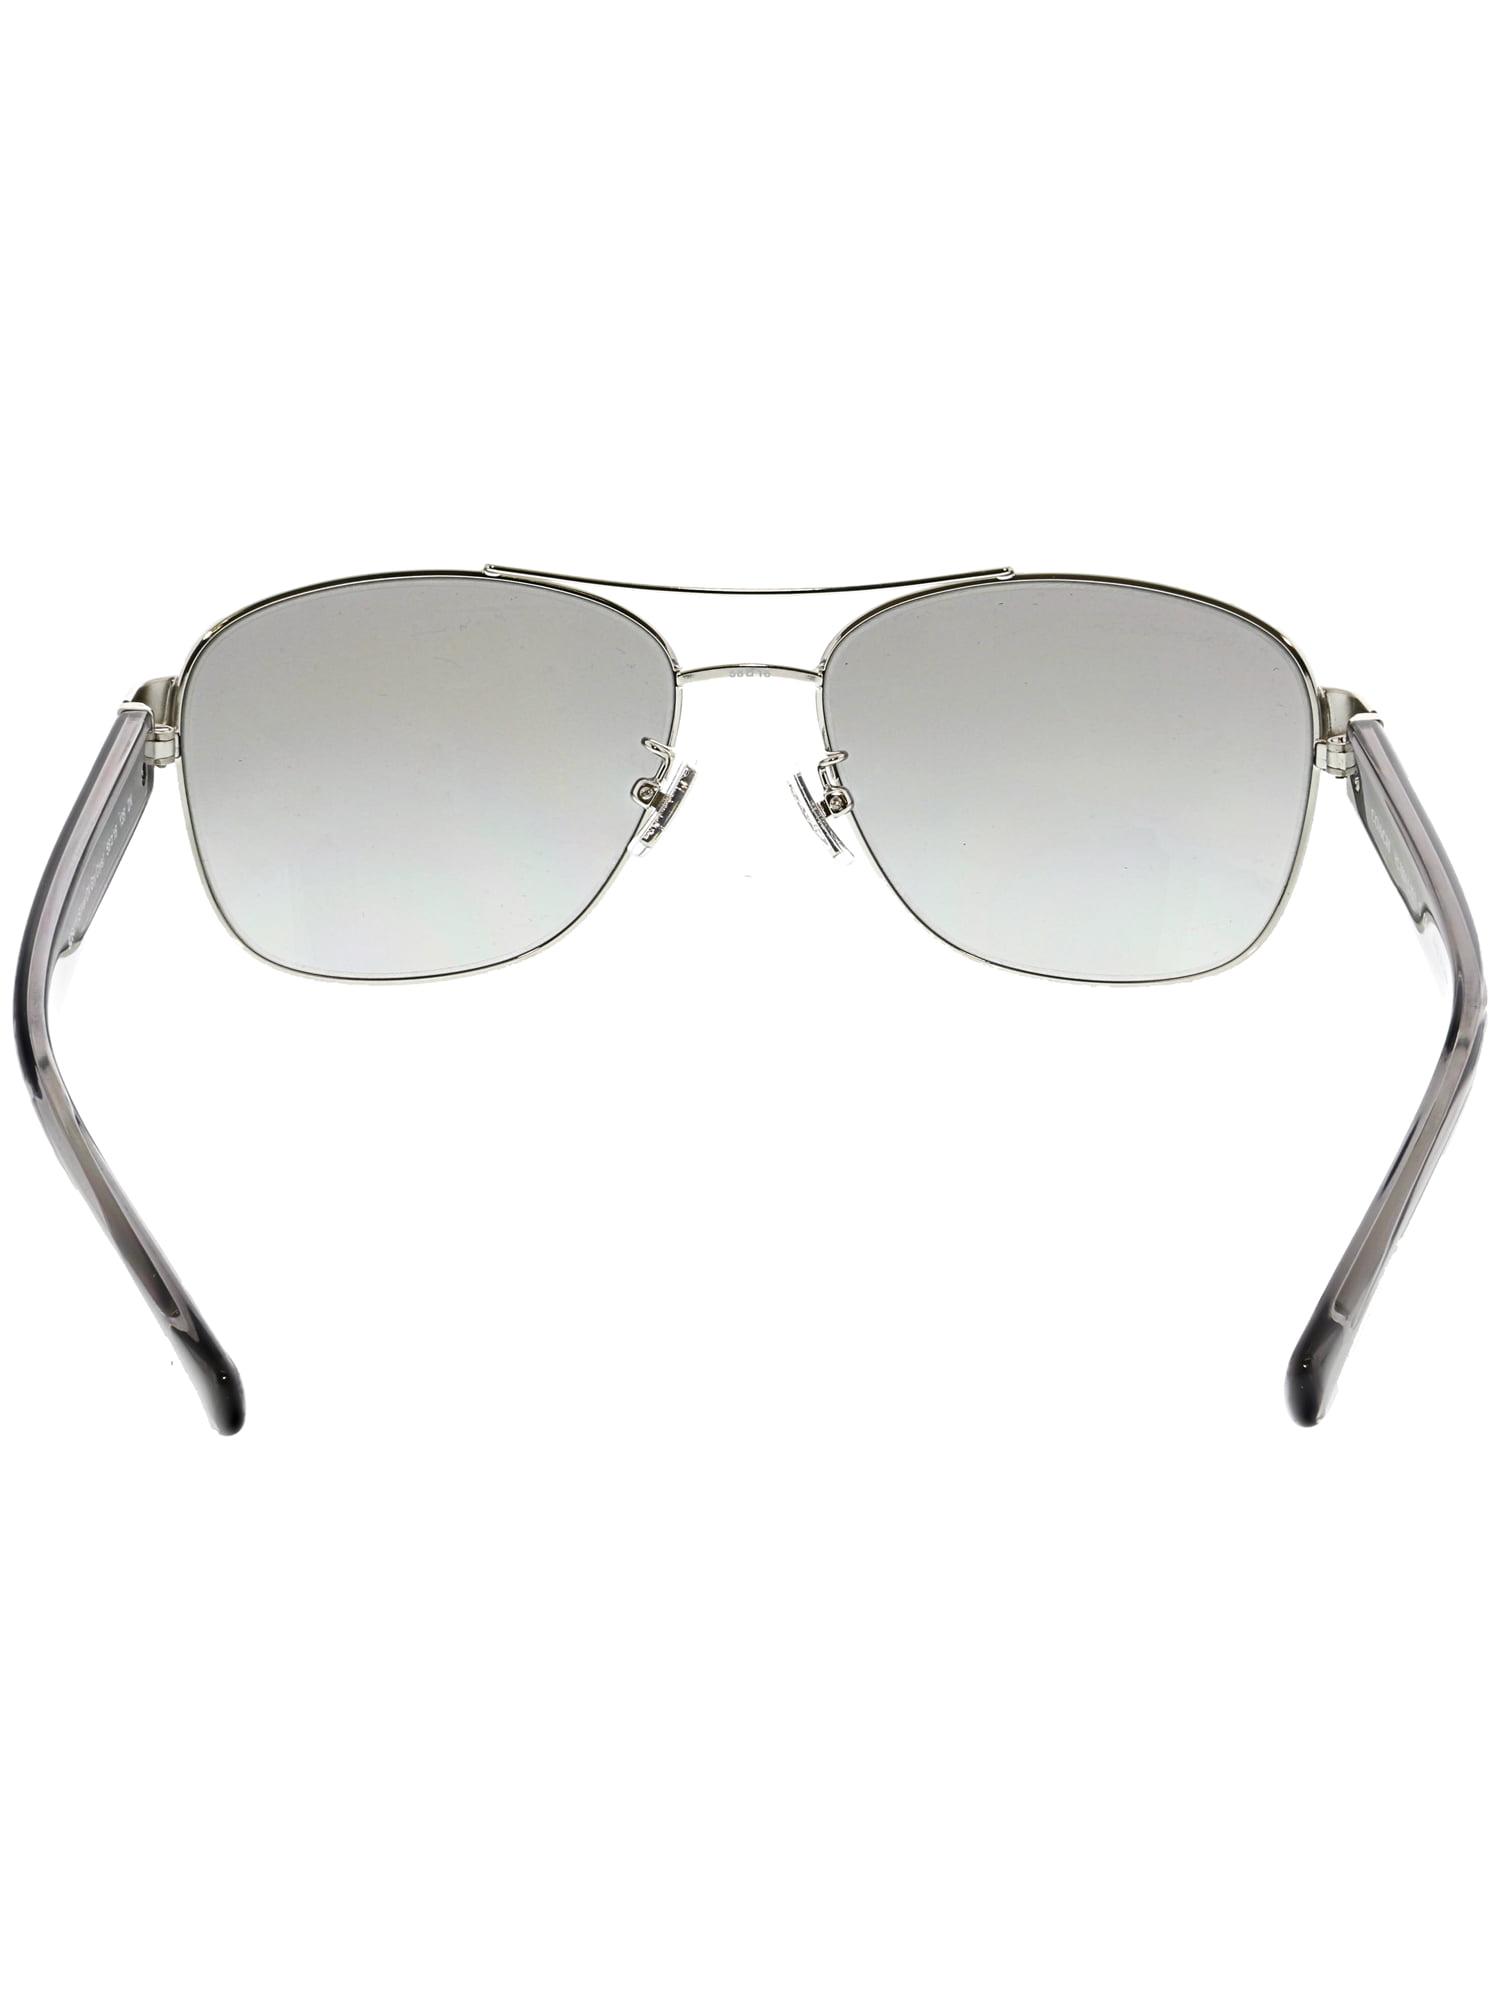 6805608f32 ... grey gradient lens 7a565 48e9c 67305 d6ad6  discount code for coach  womens hc7064 926411 56 silver aviator sunglasses 8914f 8d813